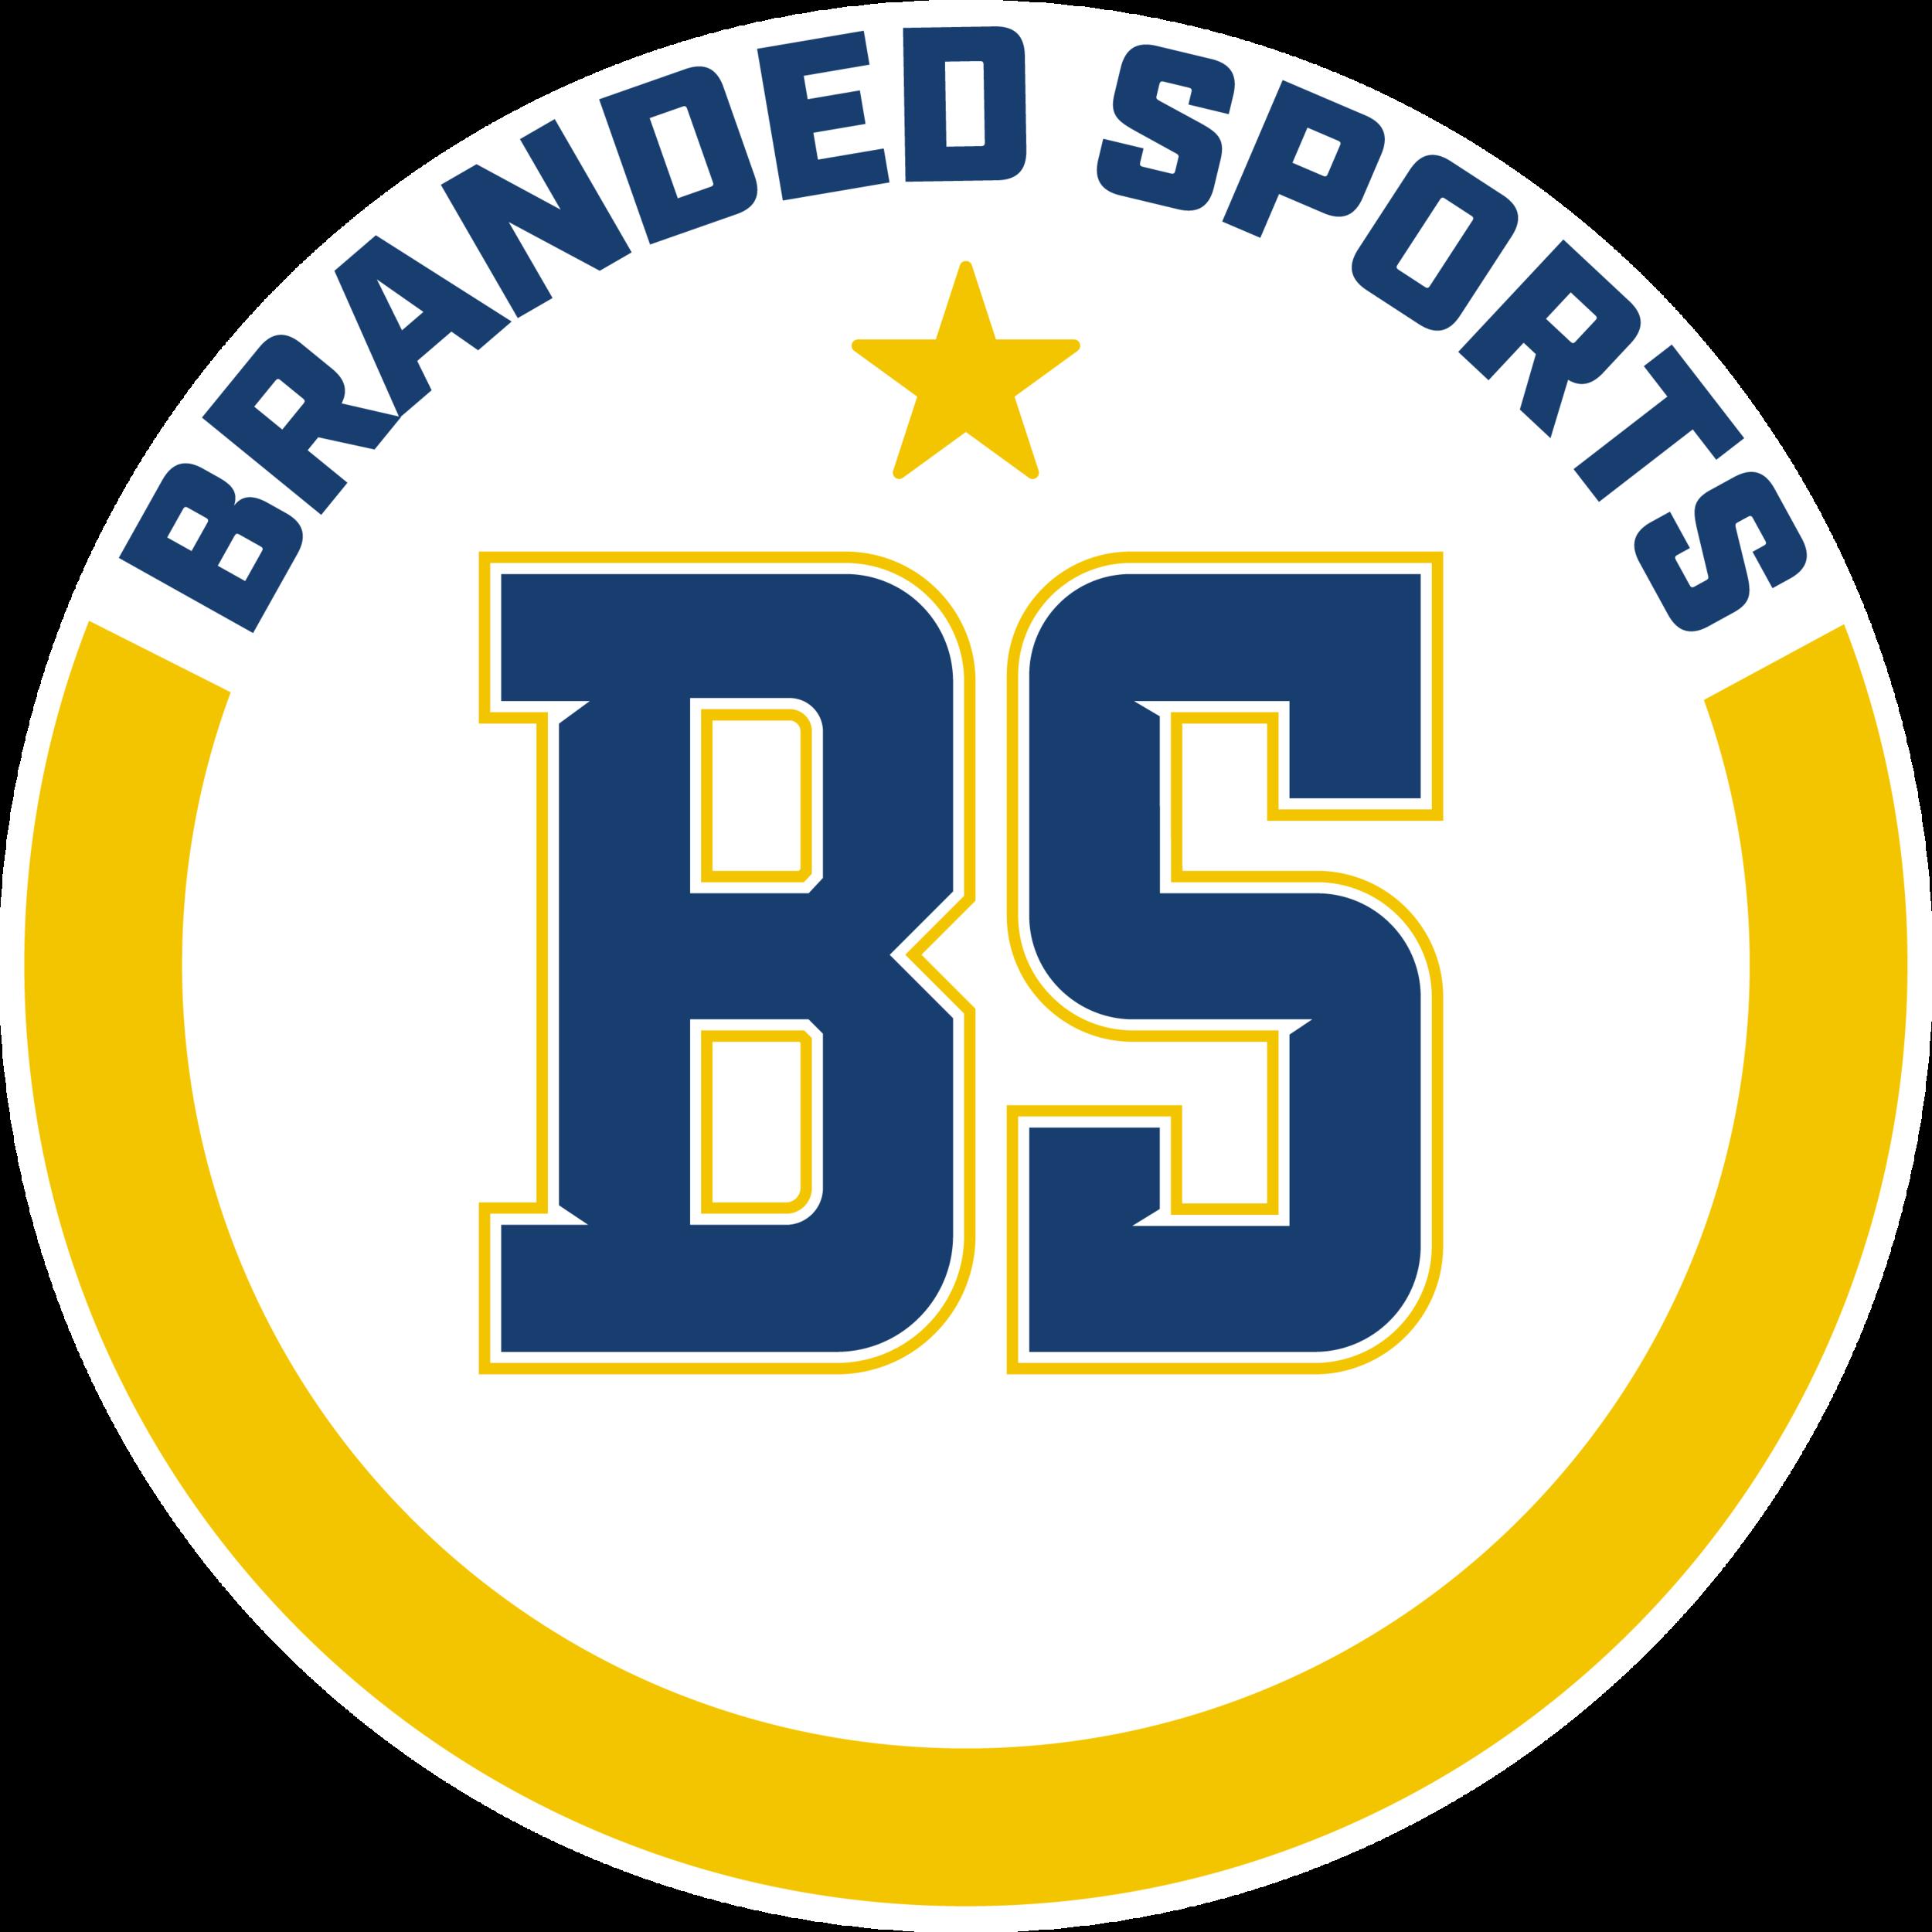 BRANDED SPORTS